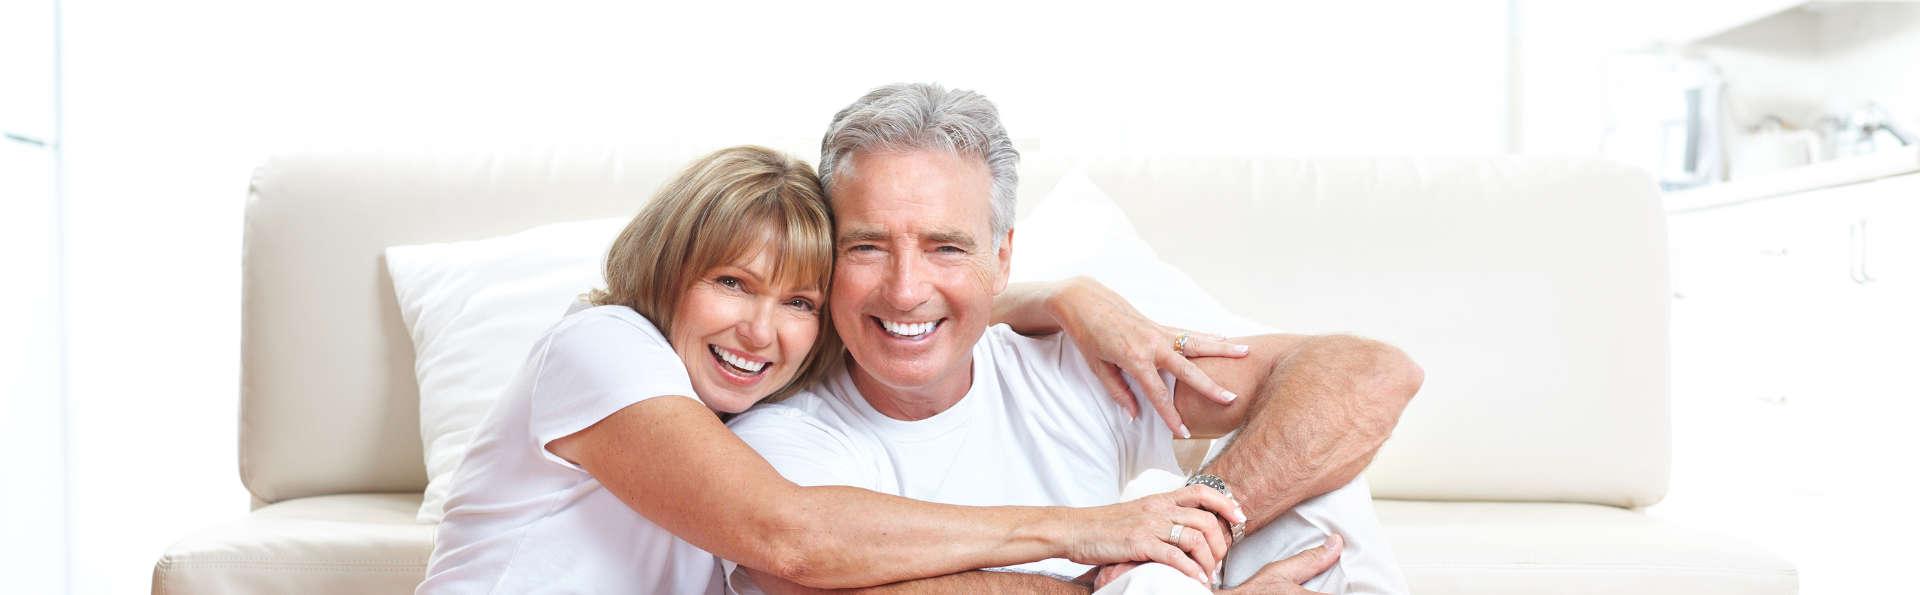 hugging smiling couple